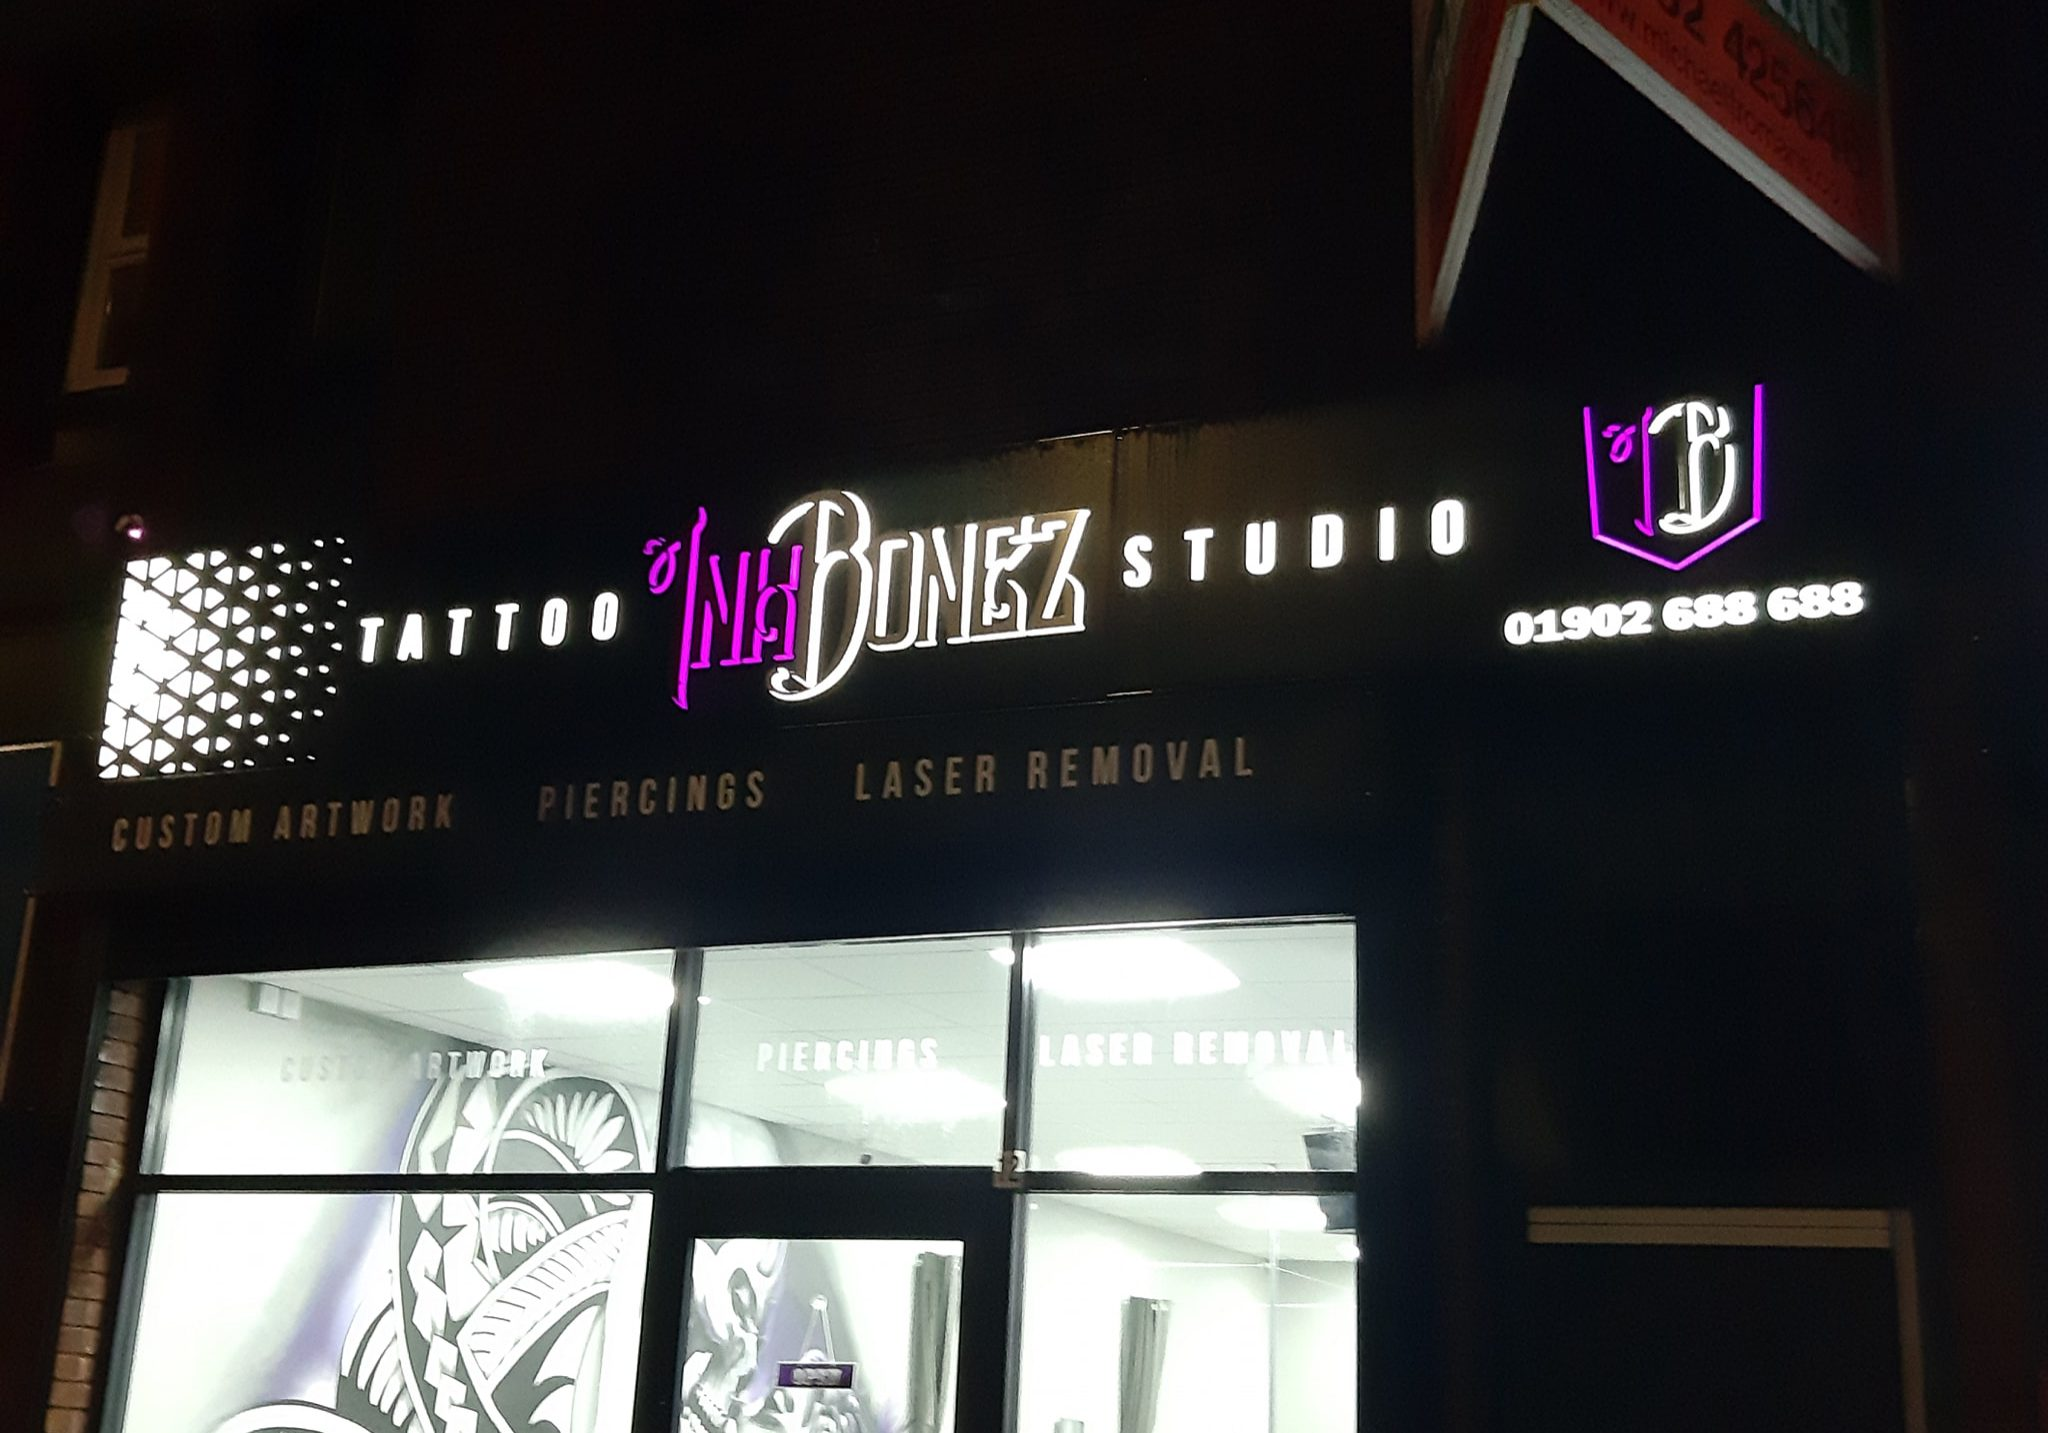 Ink Bonez Studio shop sign